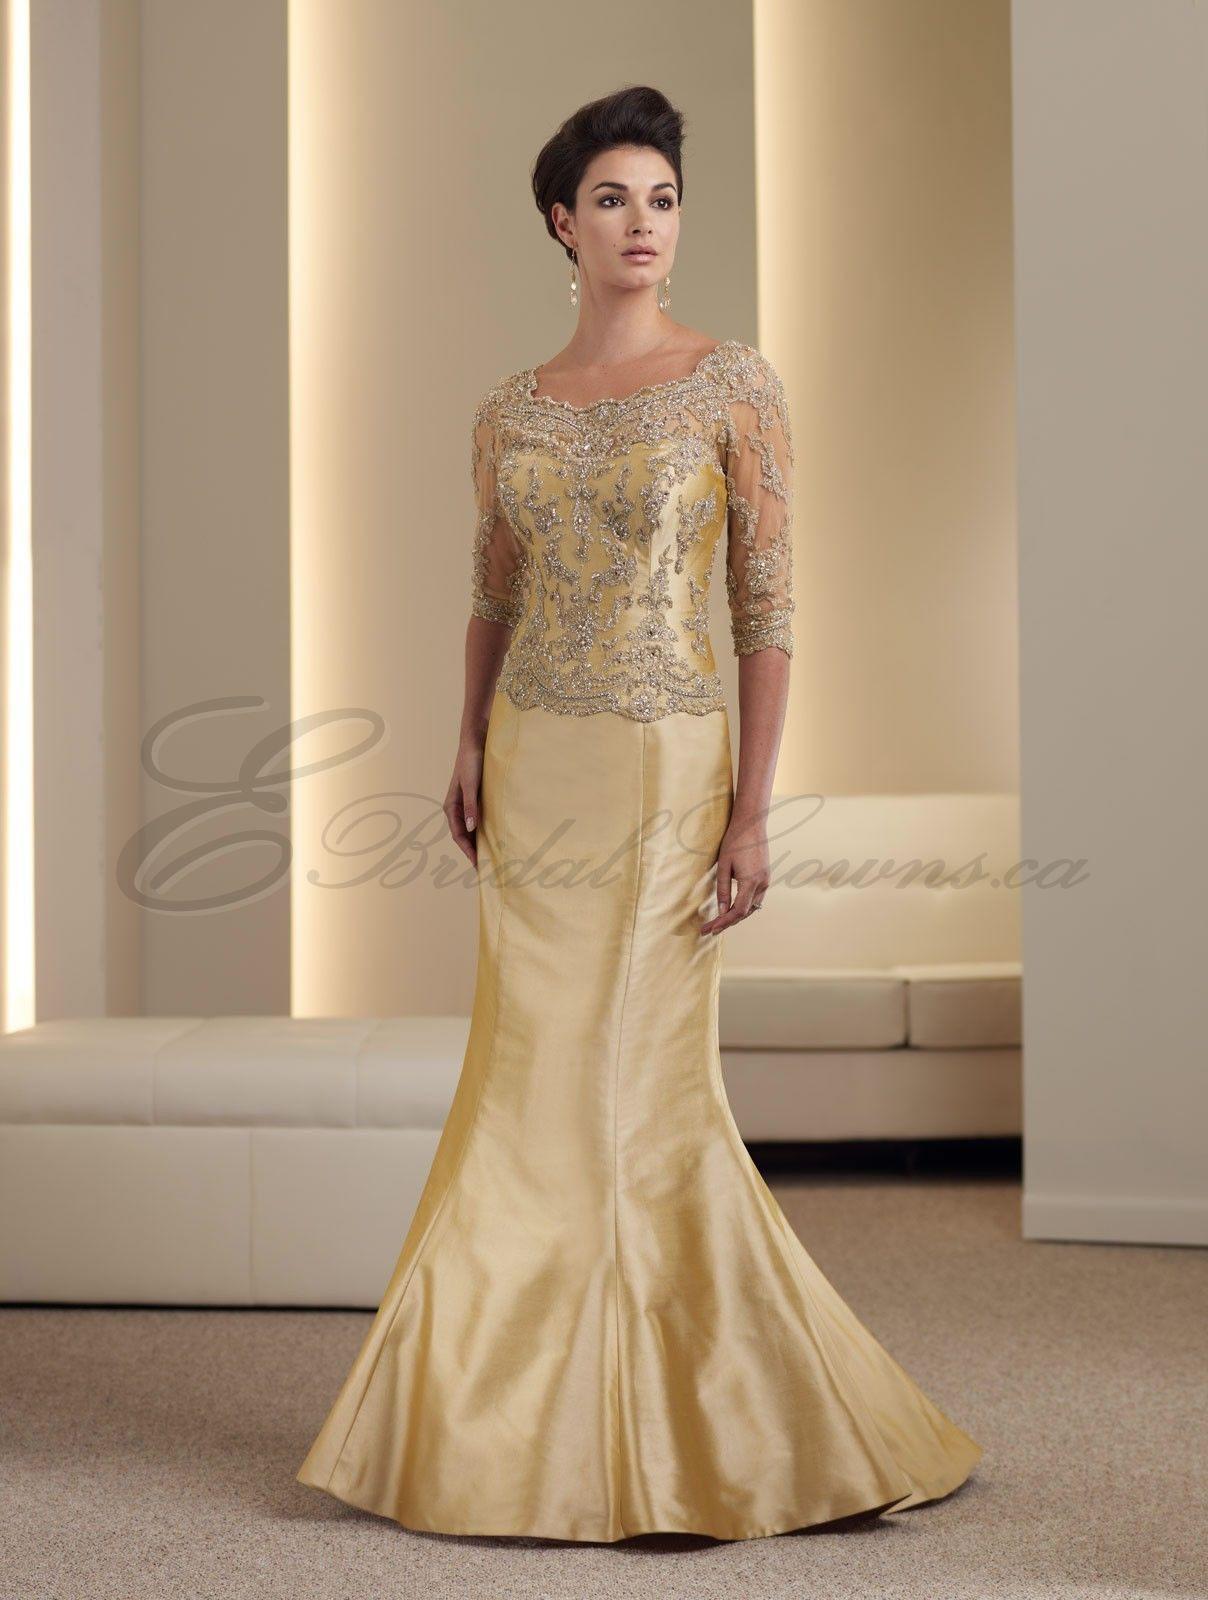 Designer Mother Of The Bride Dresses For Beach Wedding